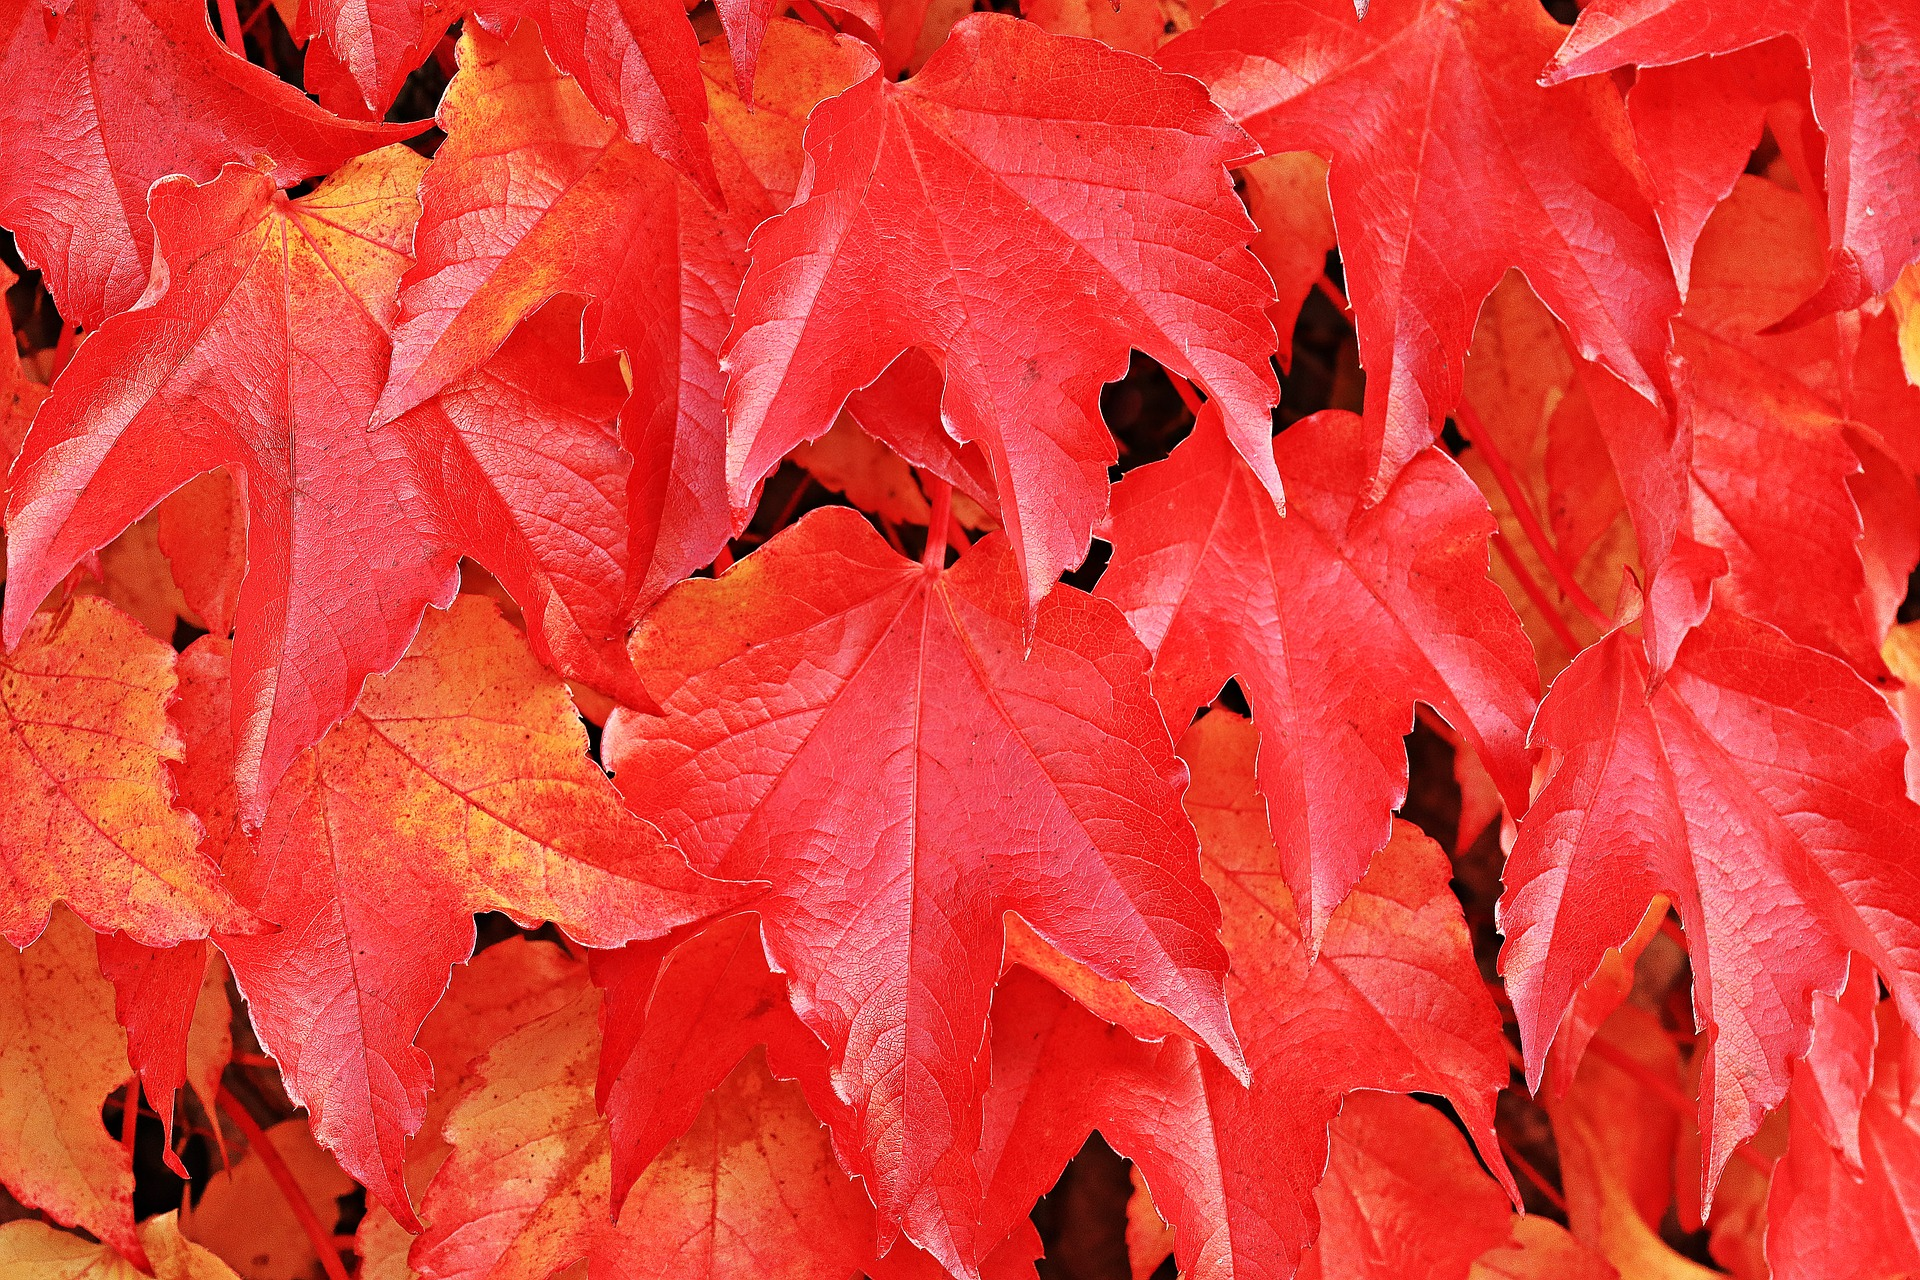 Wine Partner, Autumn, Fallen, Leaf, Leave, HQ Photo